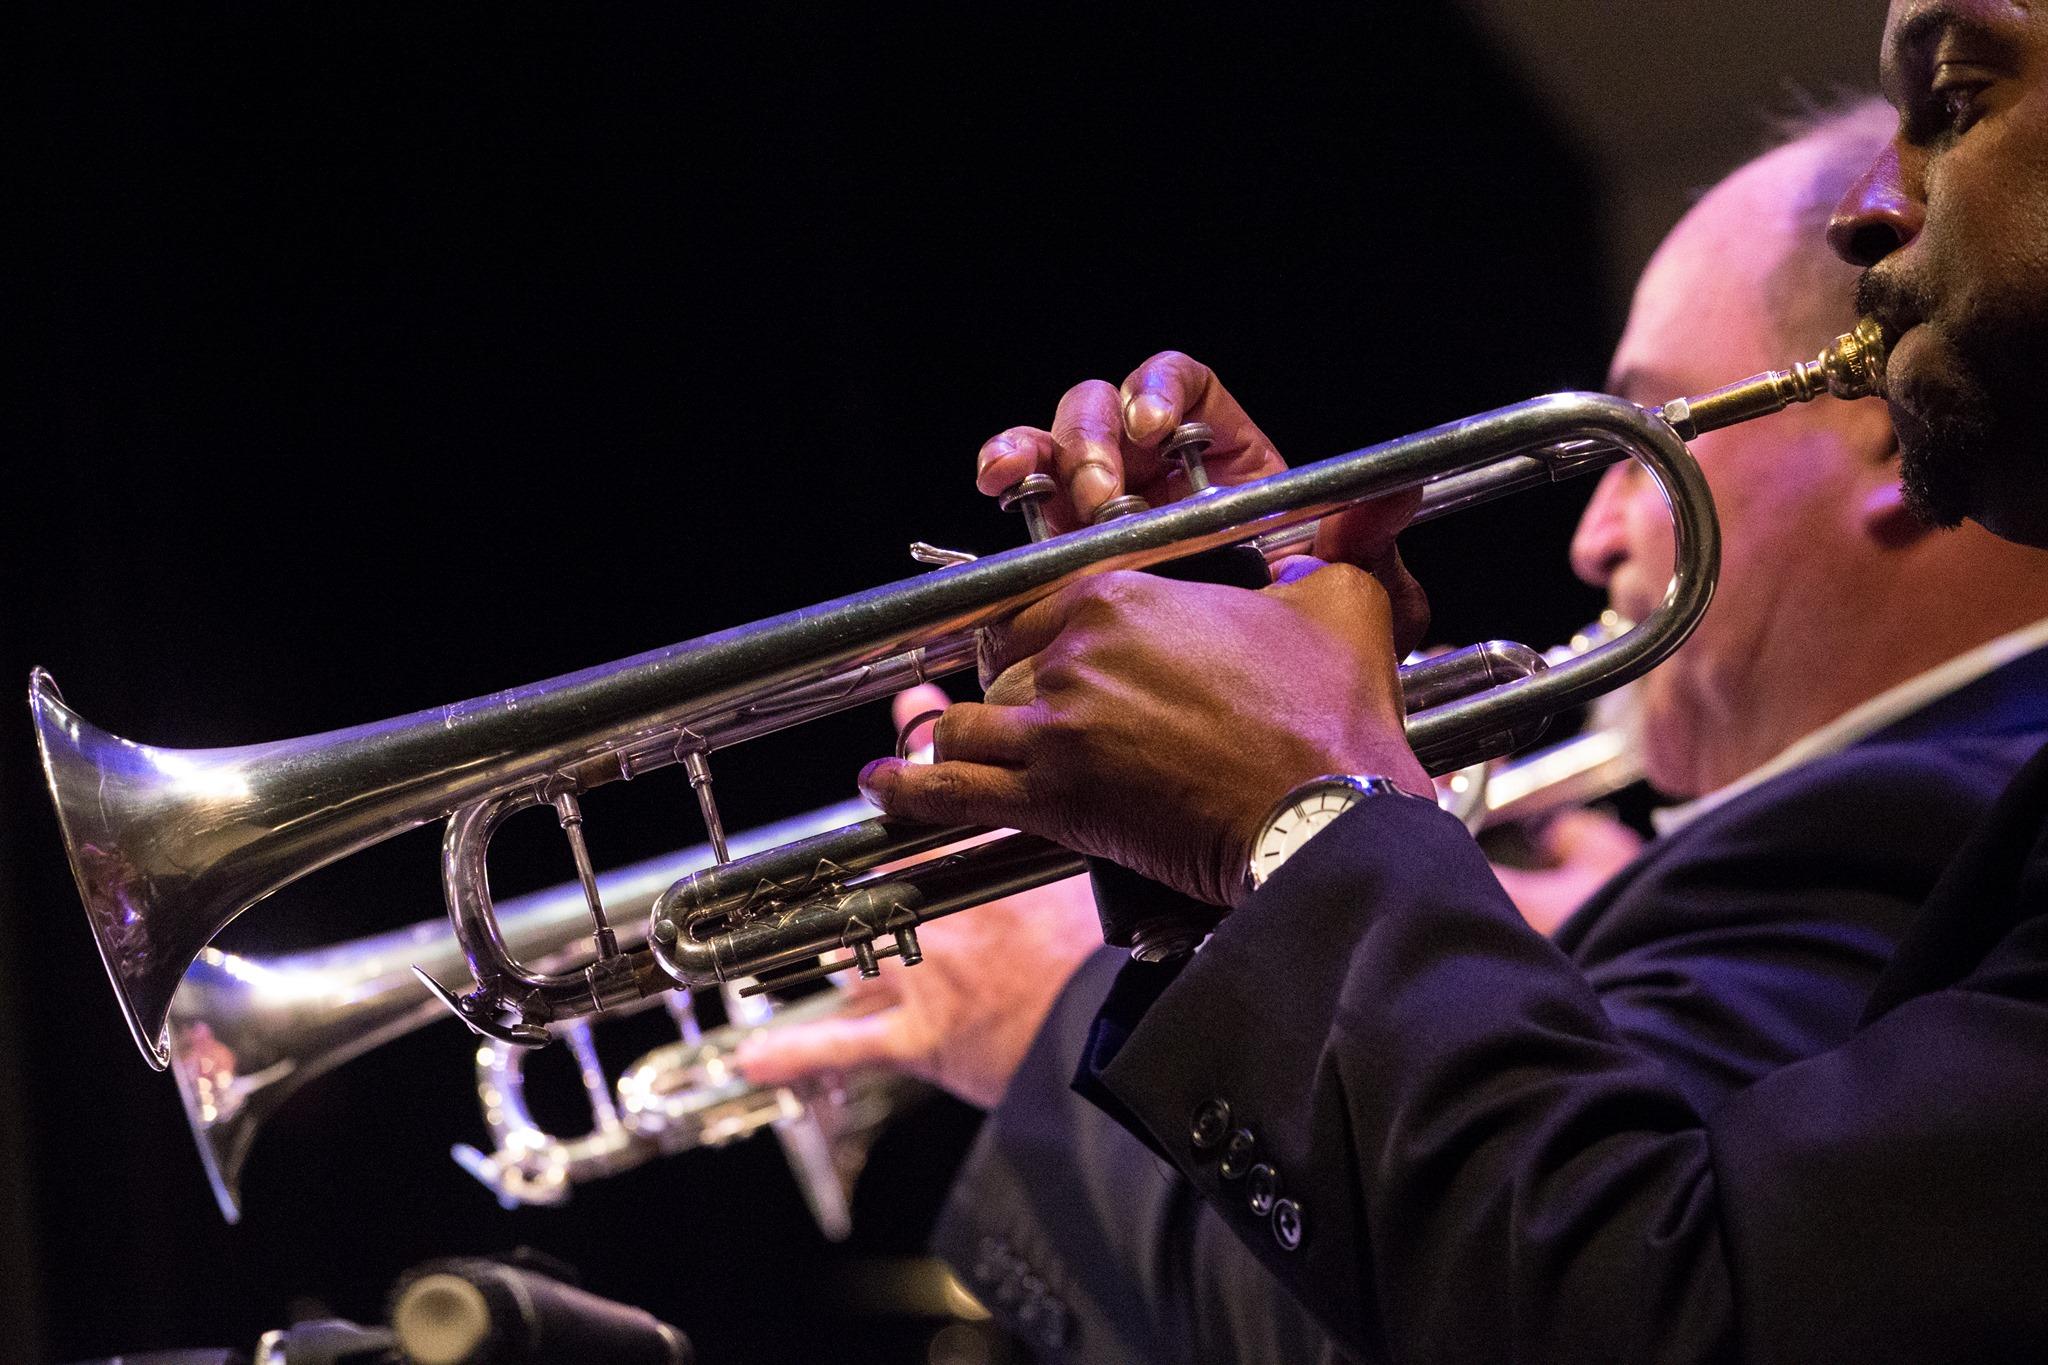 CJO: Original Works, Jazz Concert